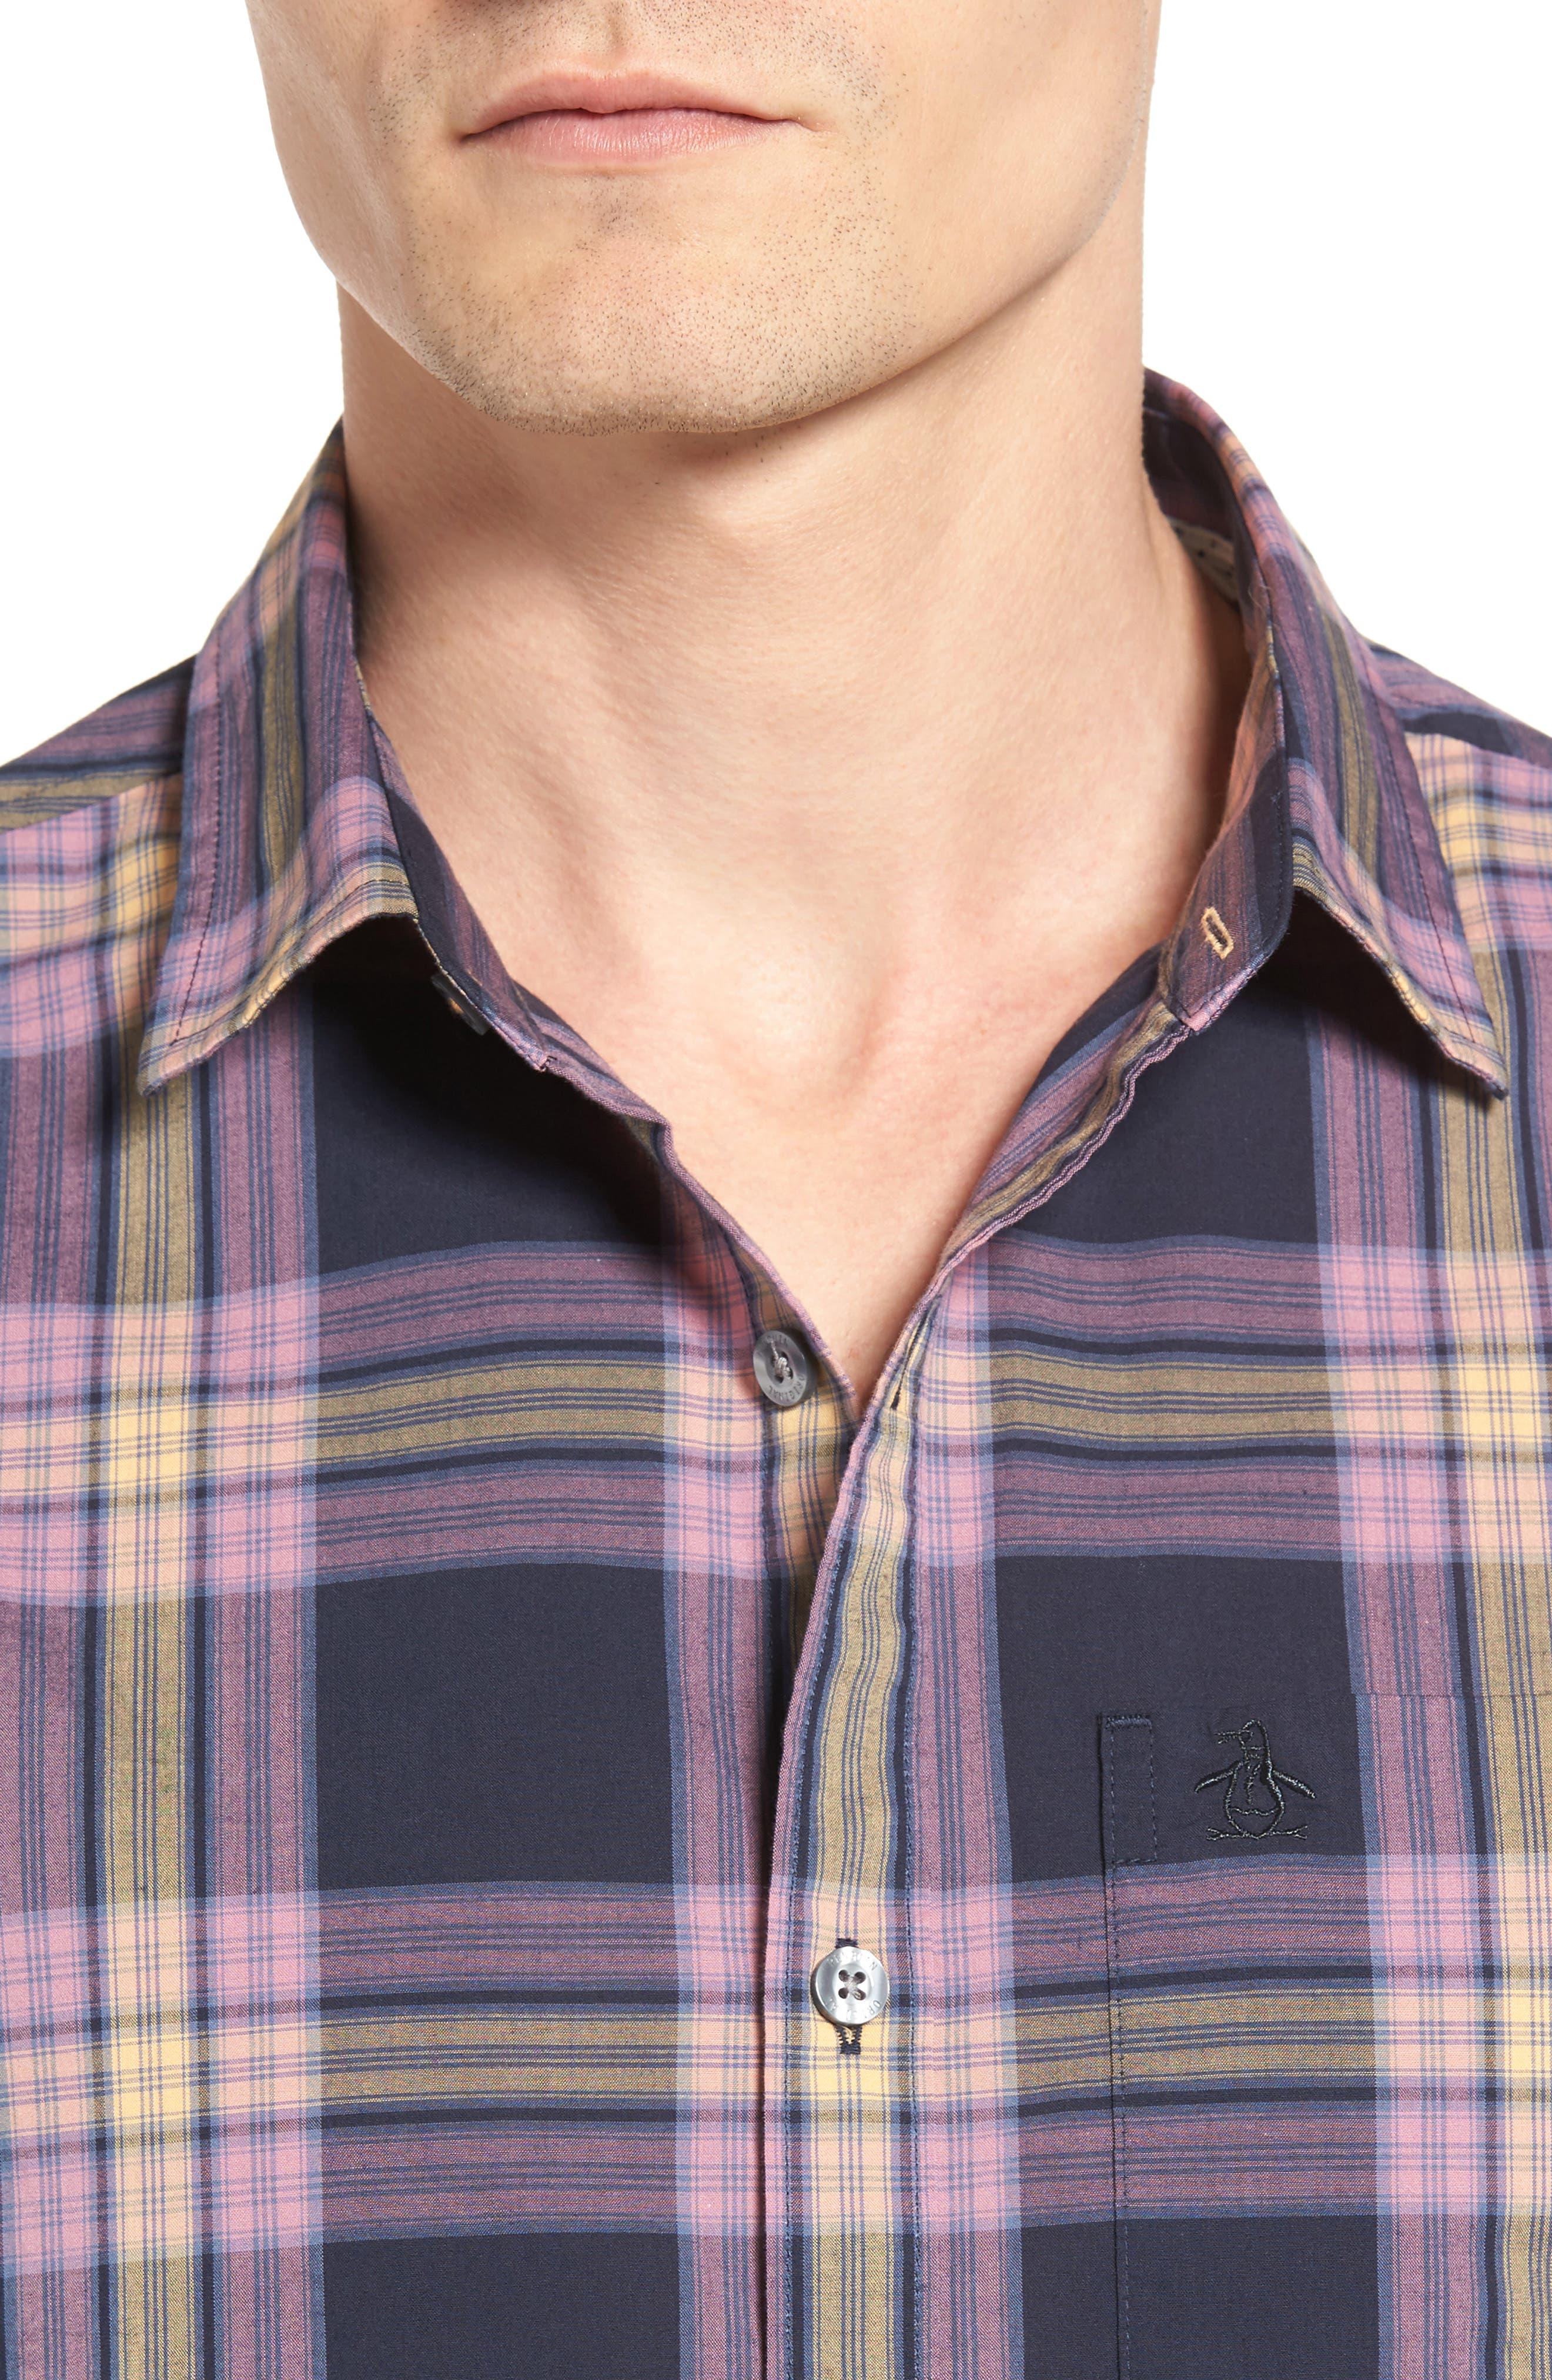 Heritage Slim Fit Plaid Woven Shirt,                             Alternate thumbnail 4, color,                             413